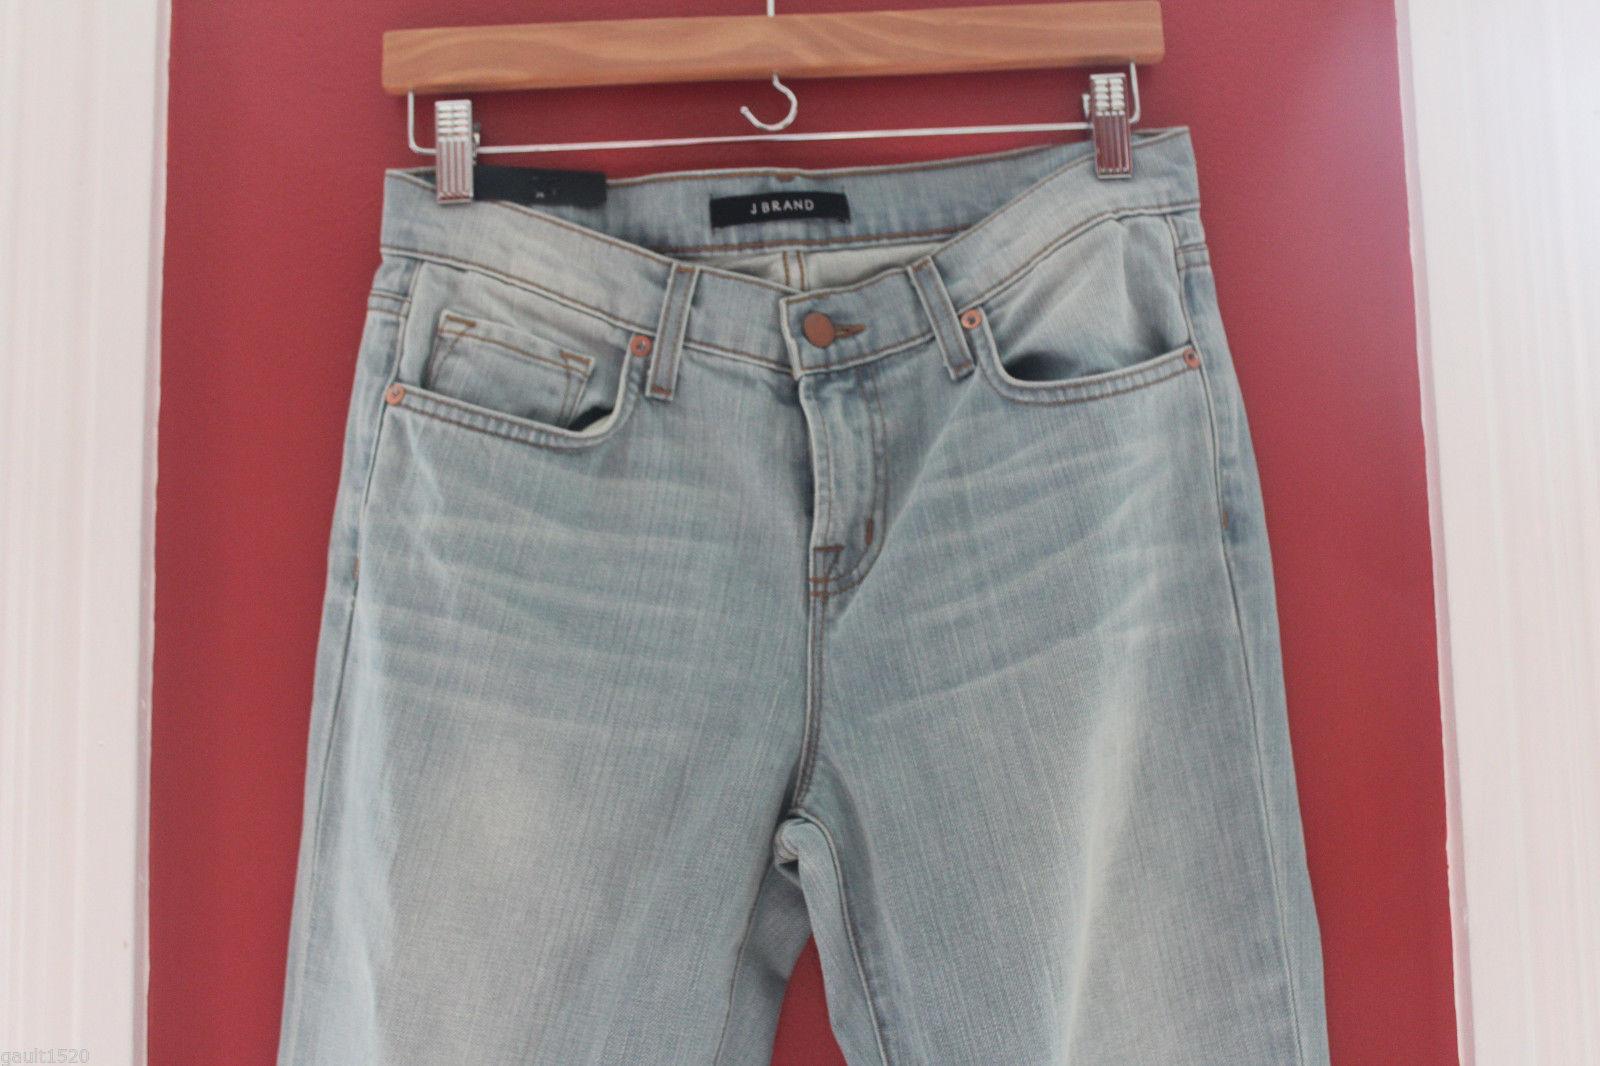 NWT J BRAND Designer Women's Aidan Slouchy Boy Jeans Denim Pants 26 2 $359 image 2